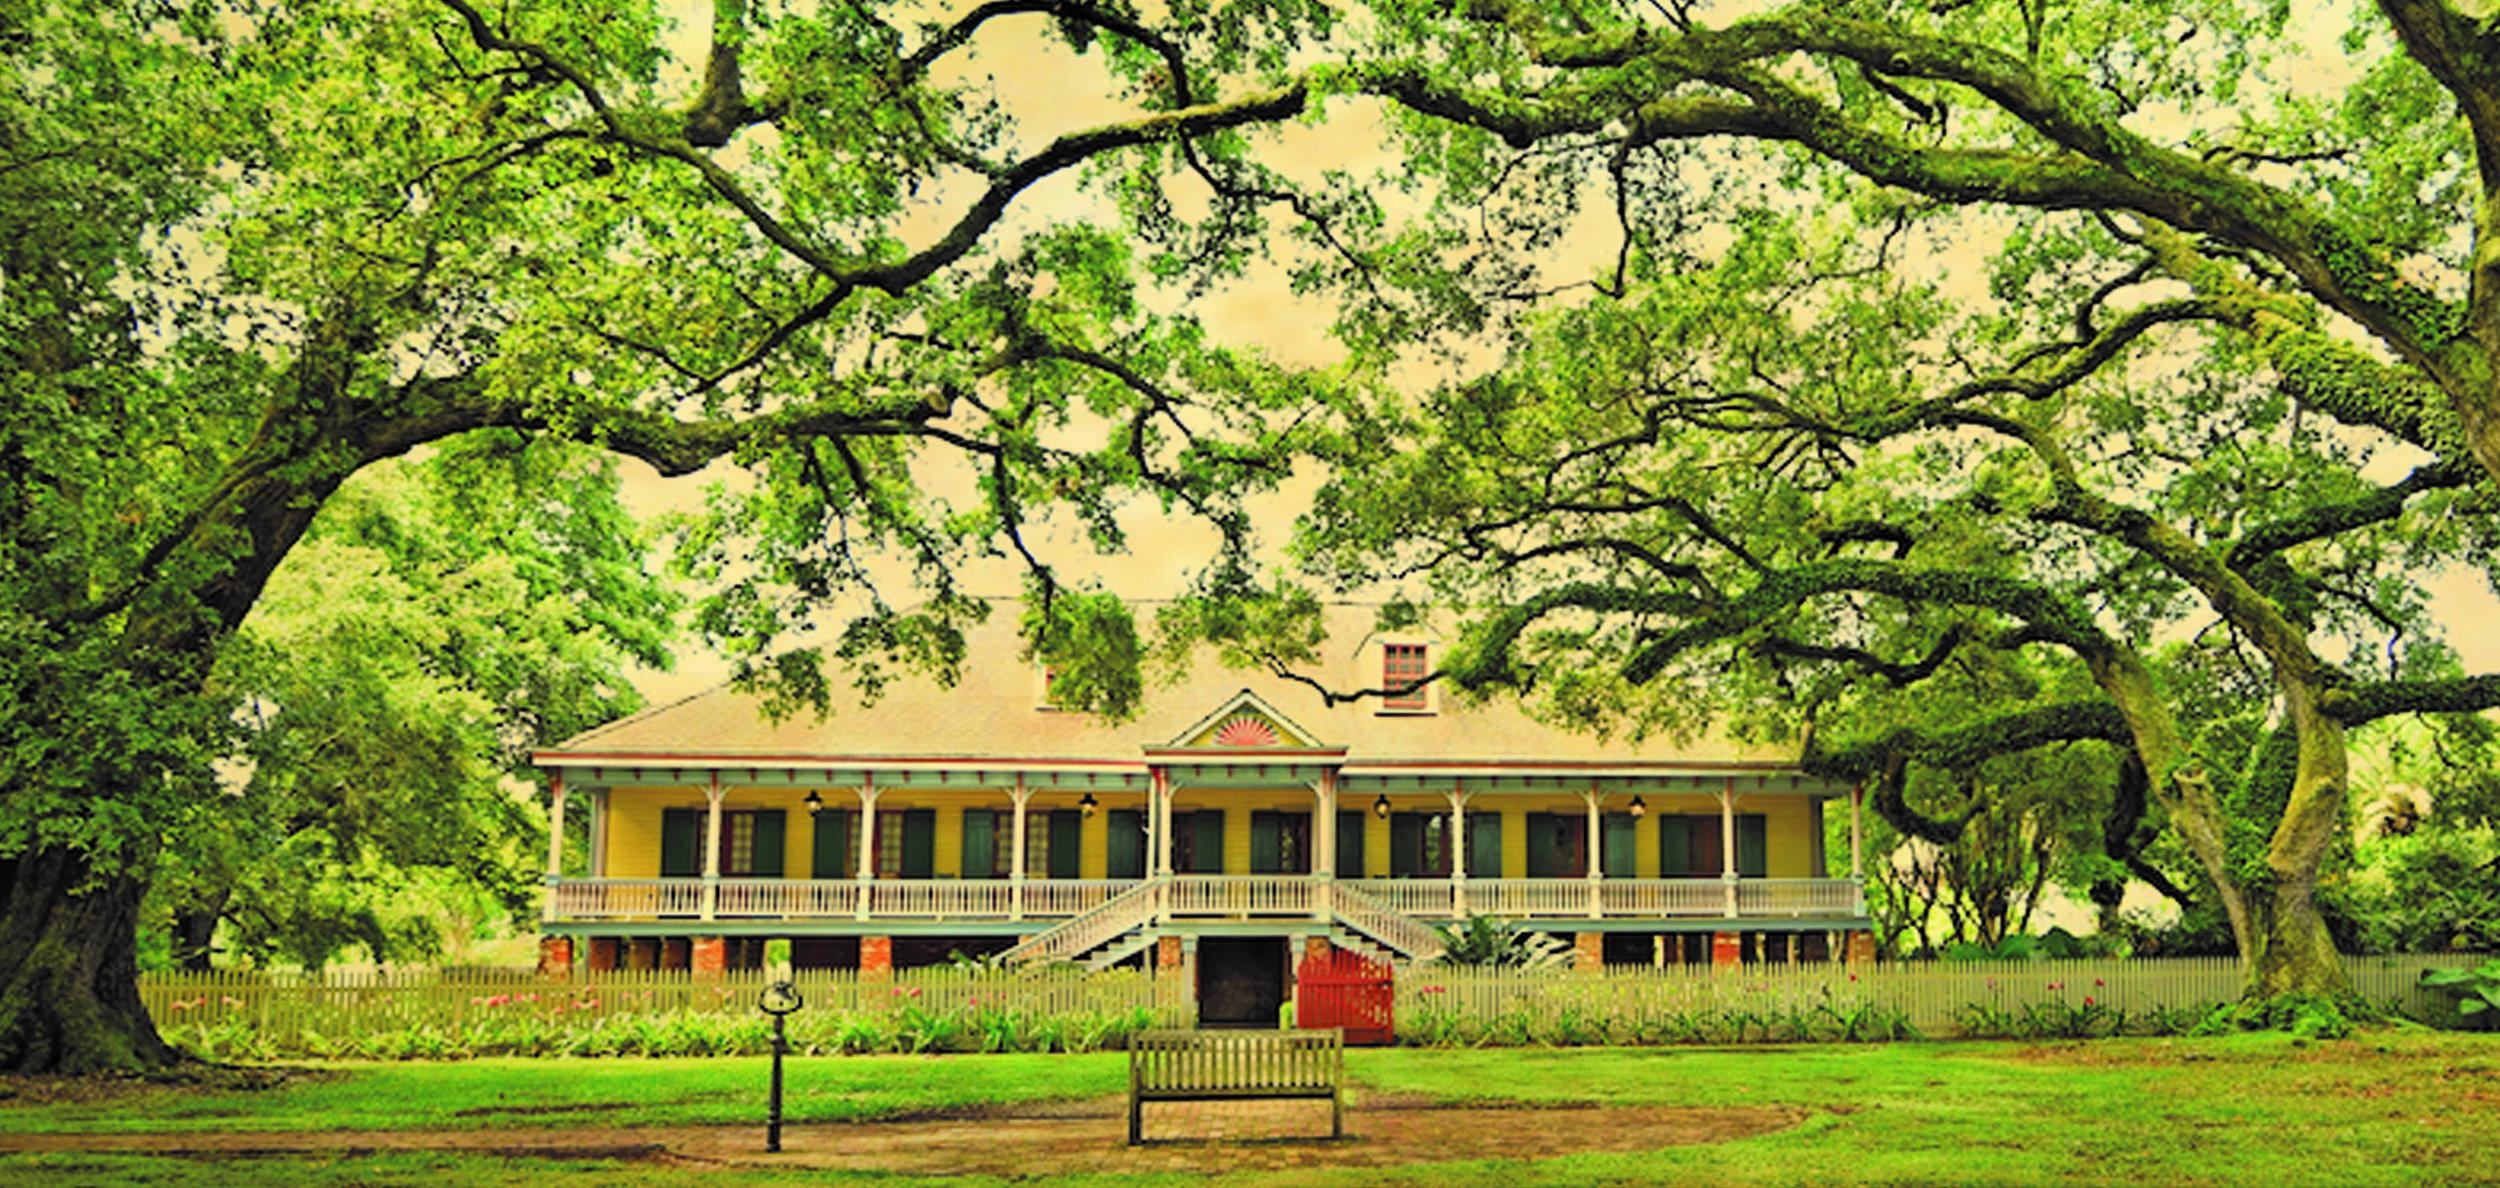 The Big House at the Laura Plantation